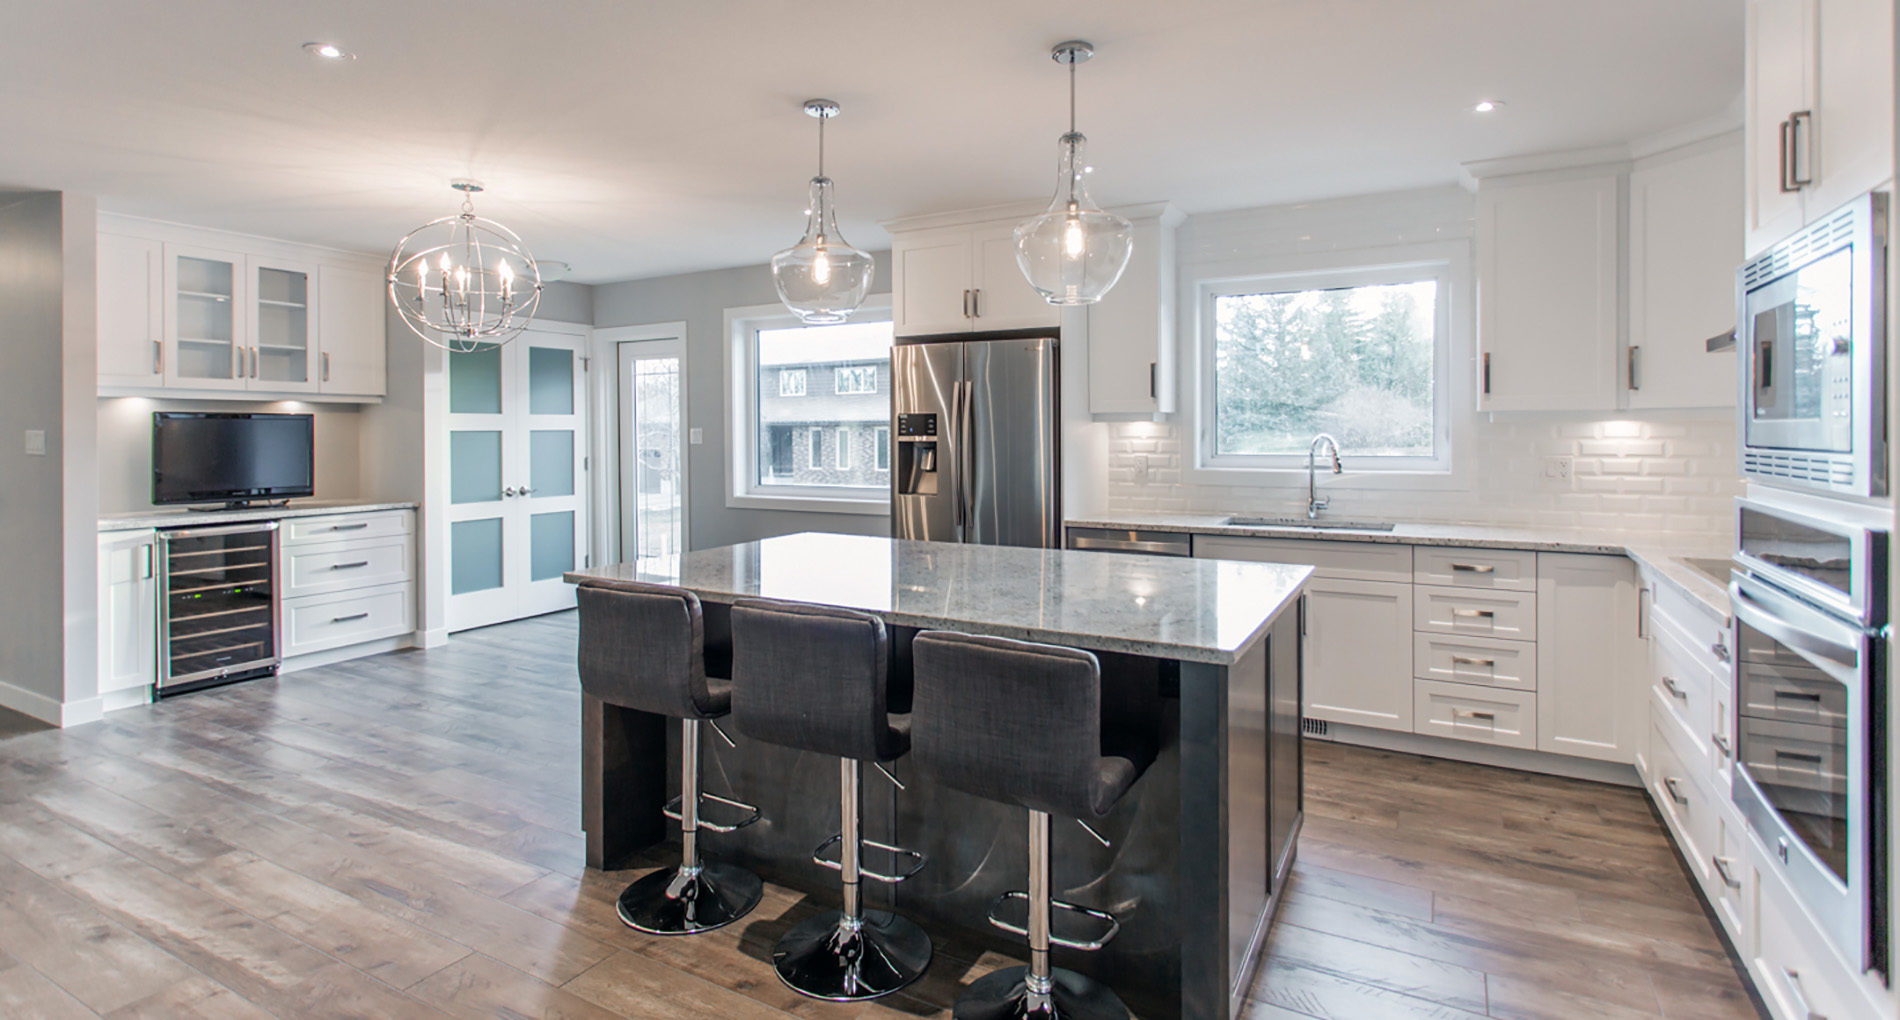 Kitchen Renovation Brandon Windsorplace Slider